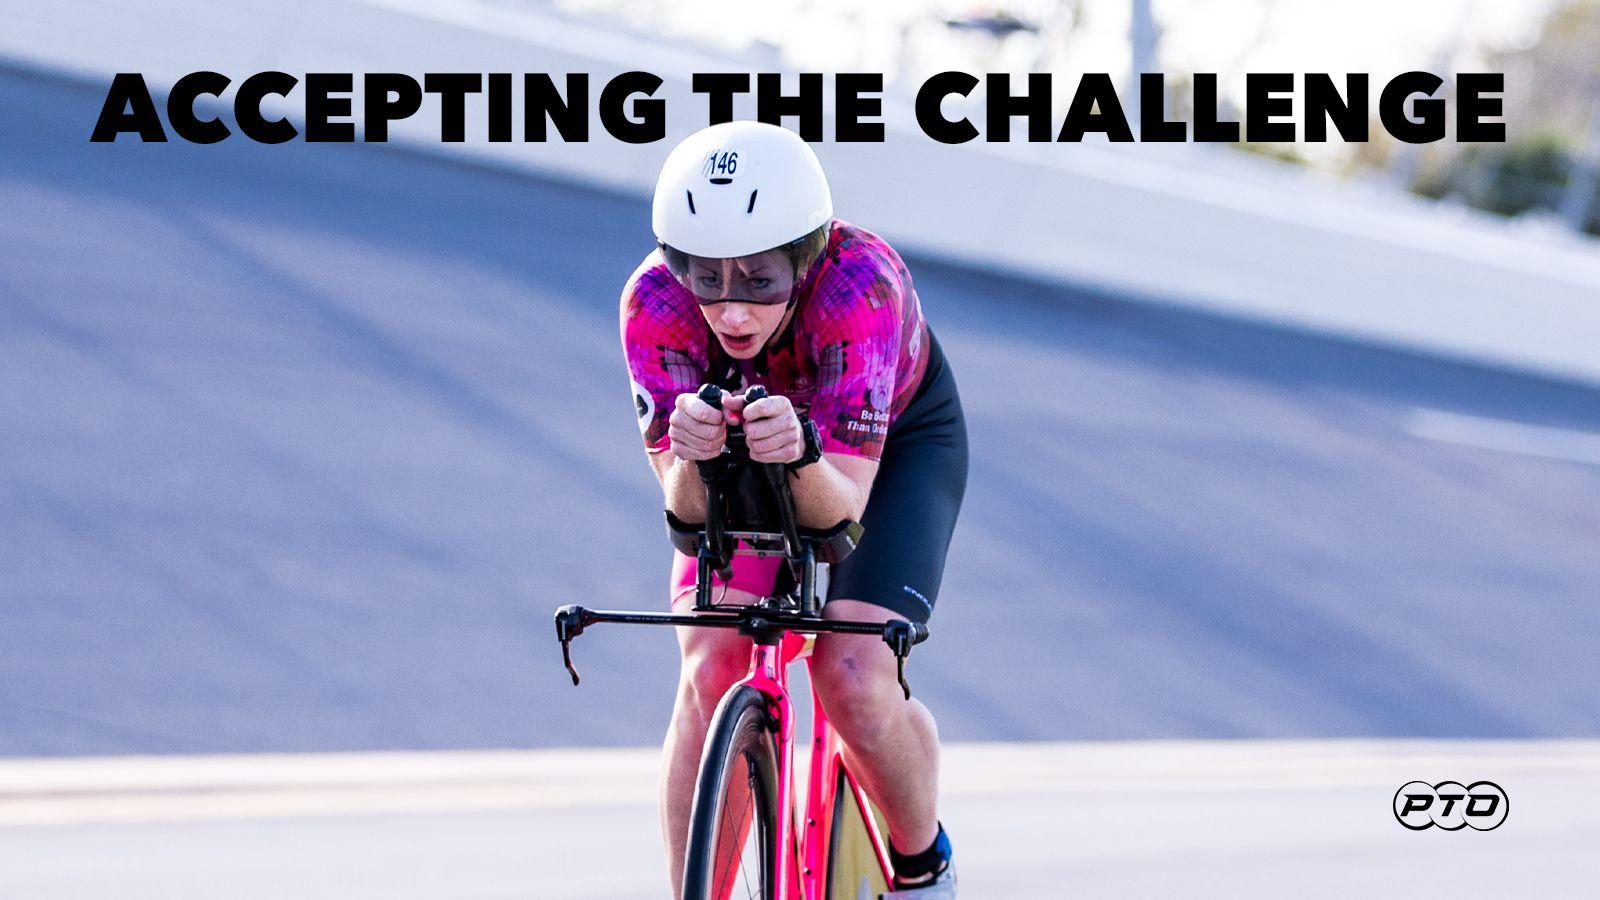 Accepting the challenge: Renee Kiley's epic journey